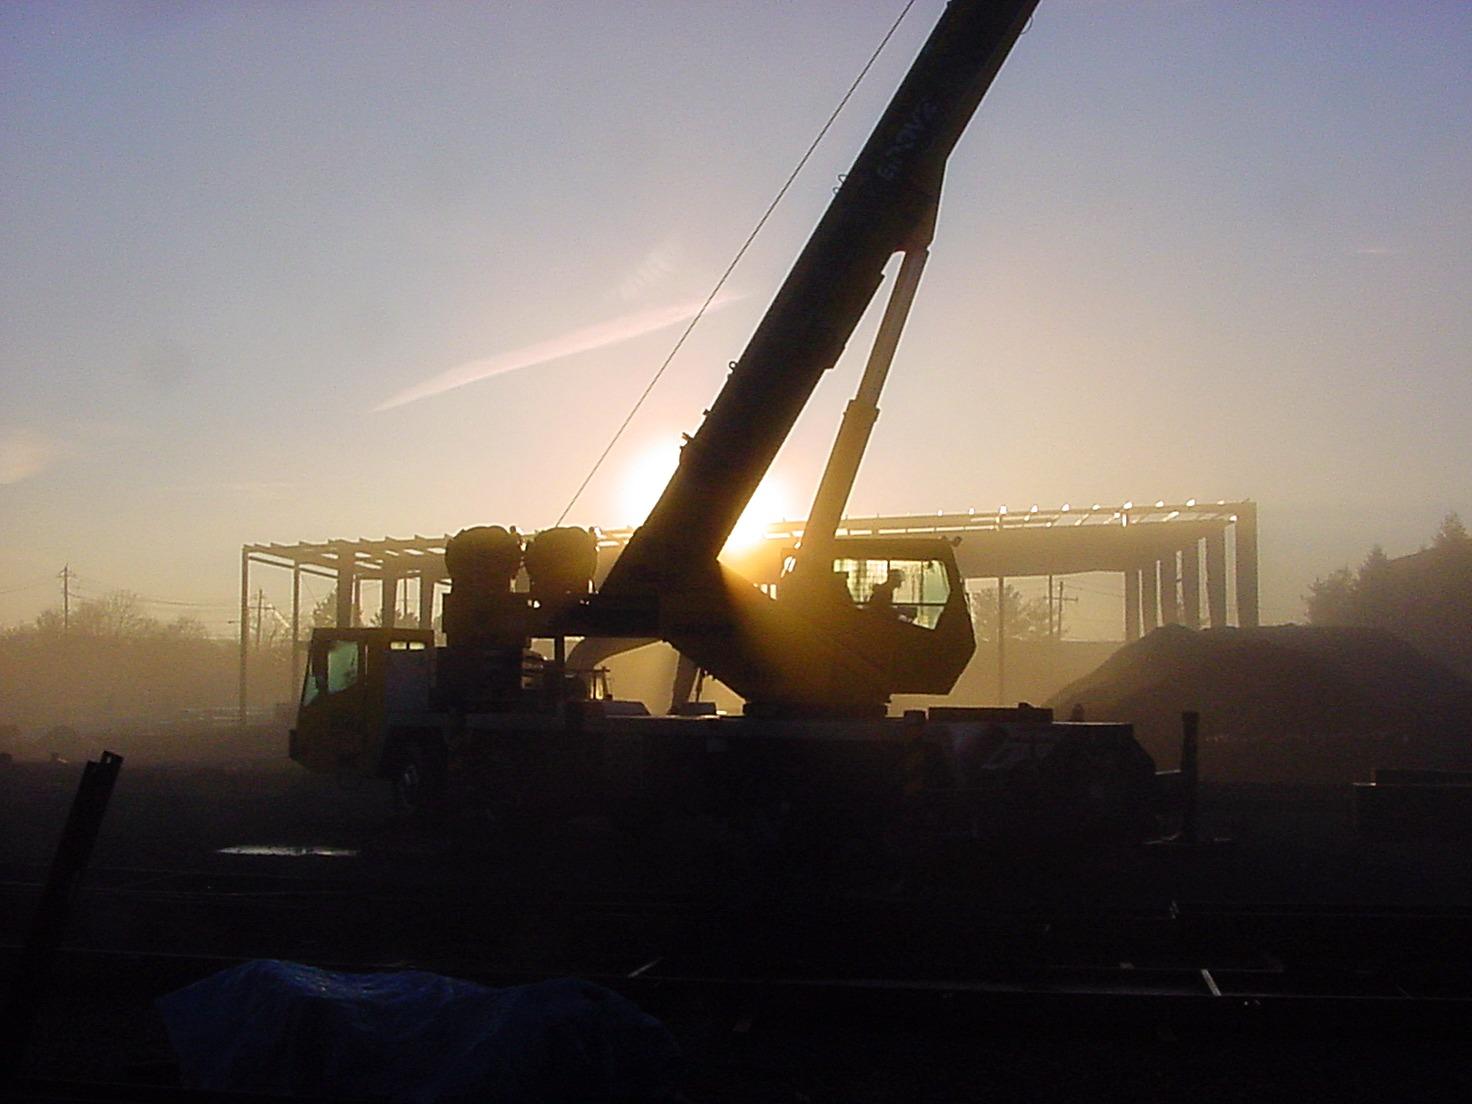 60 Ton Crane Service for Rental